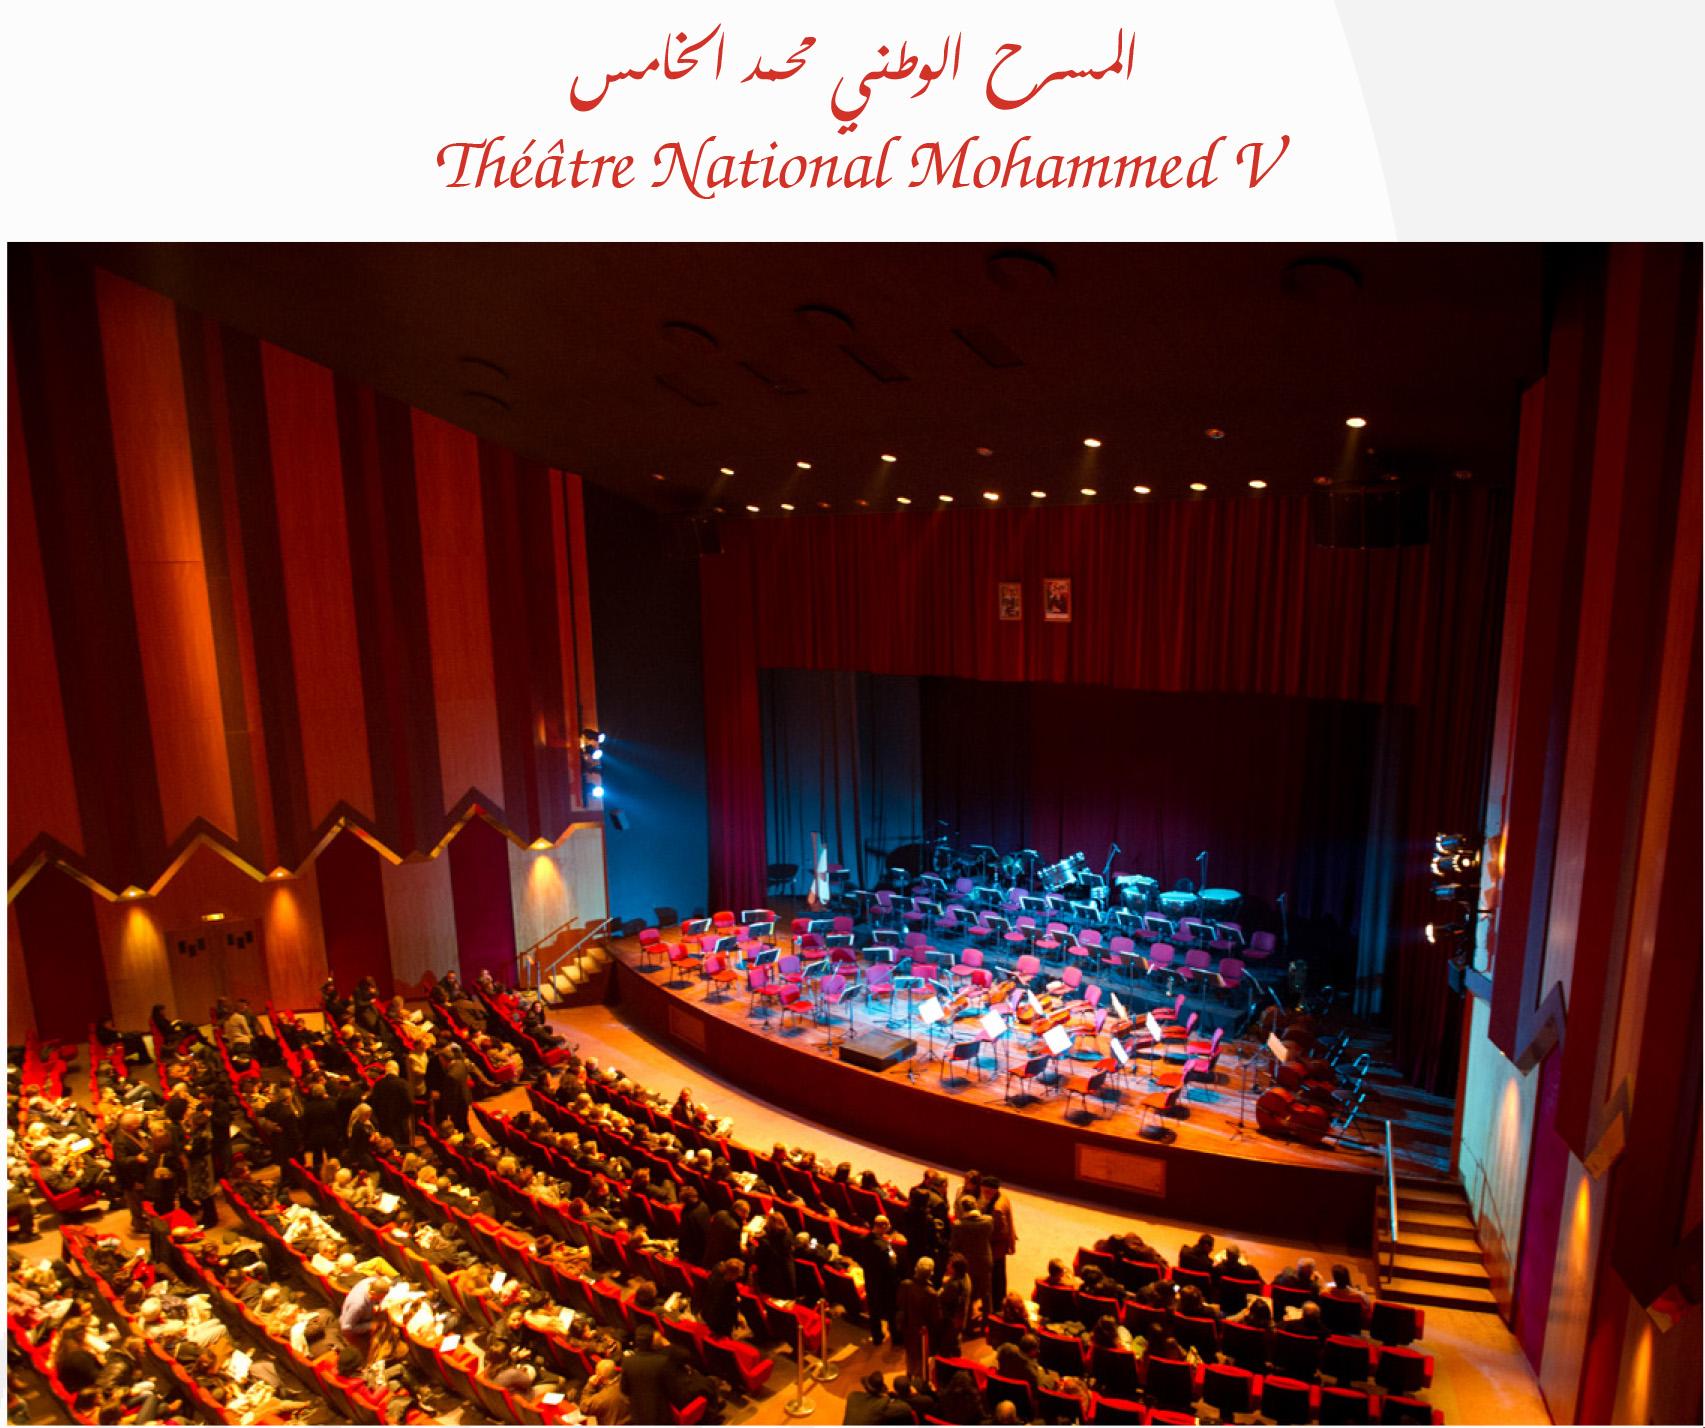 Théatre National Mohammed V